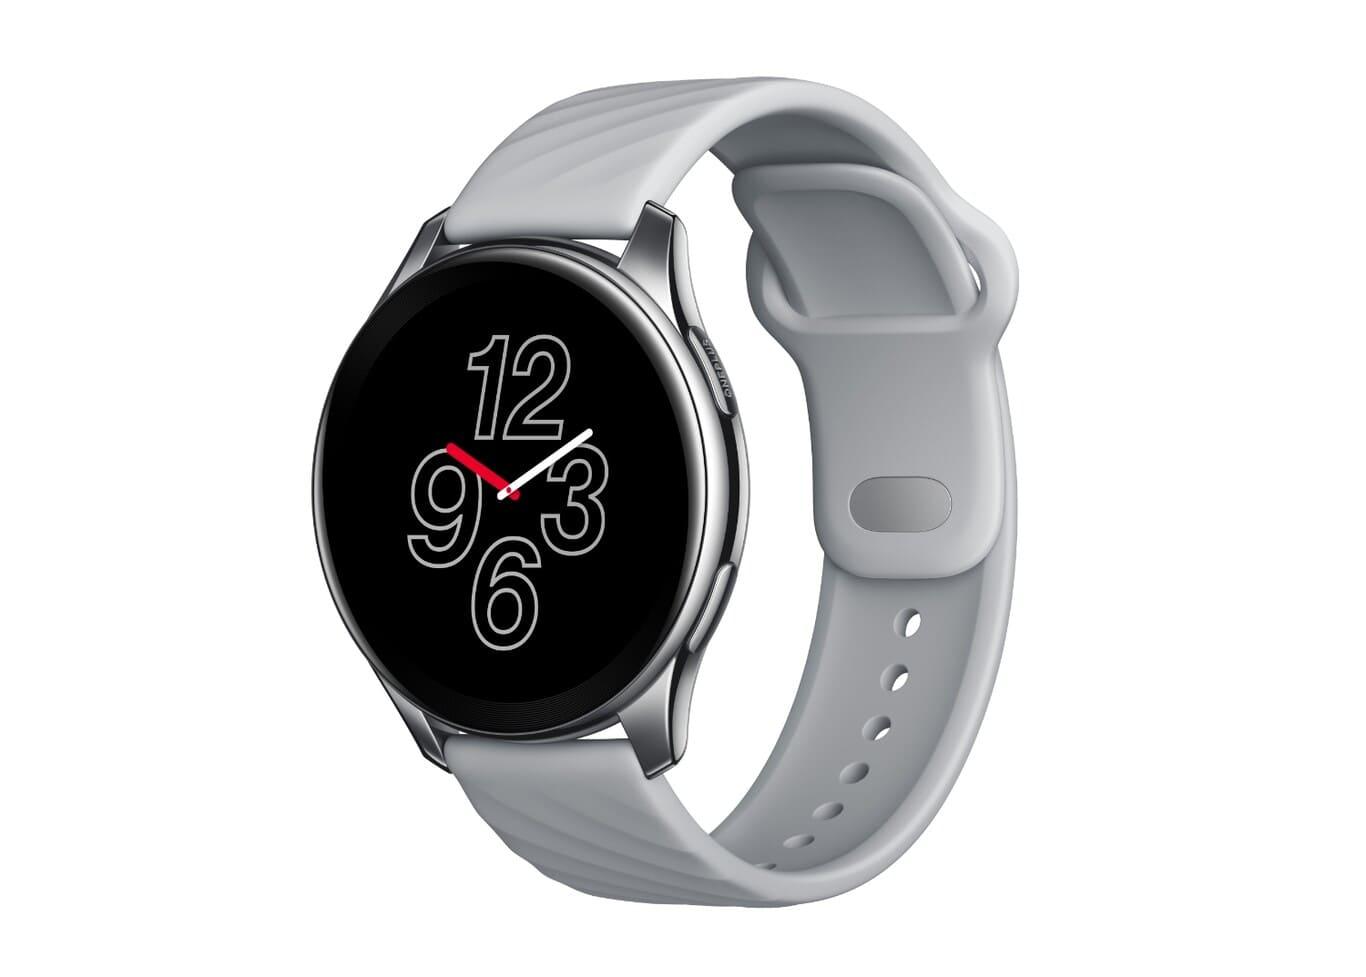 oneplus watch diseno blanco